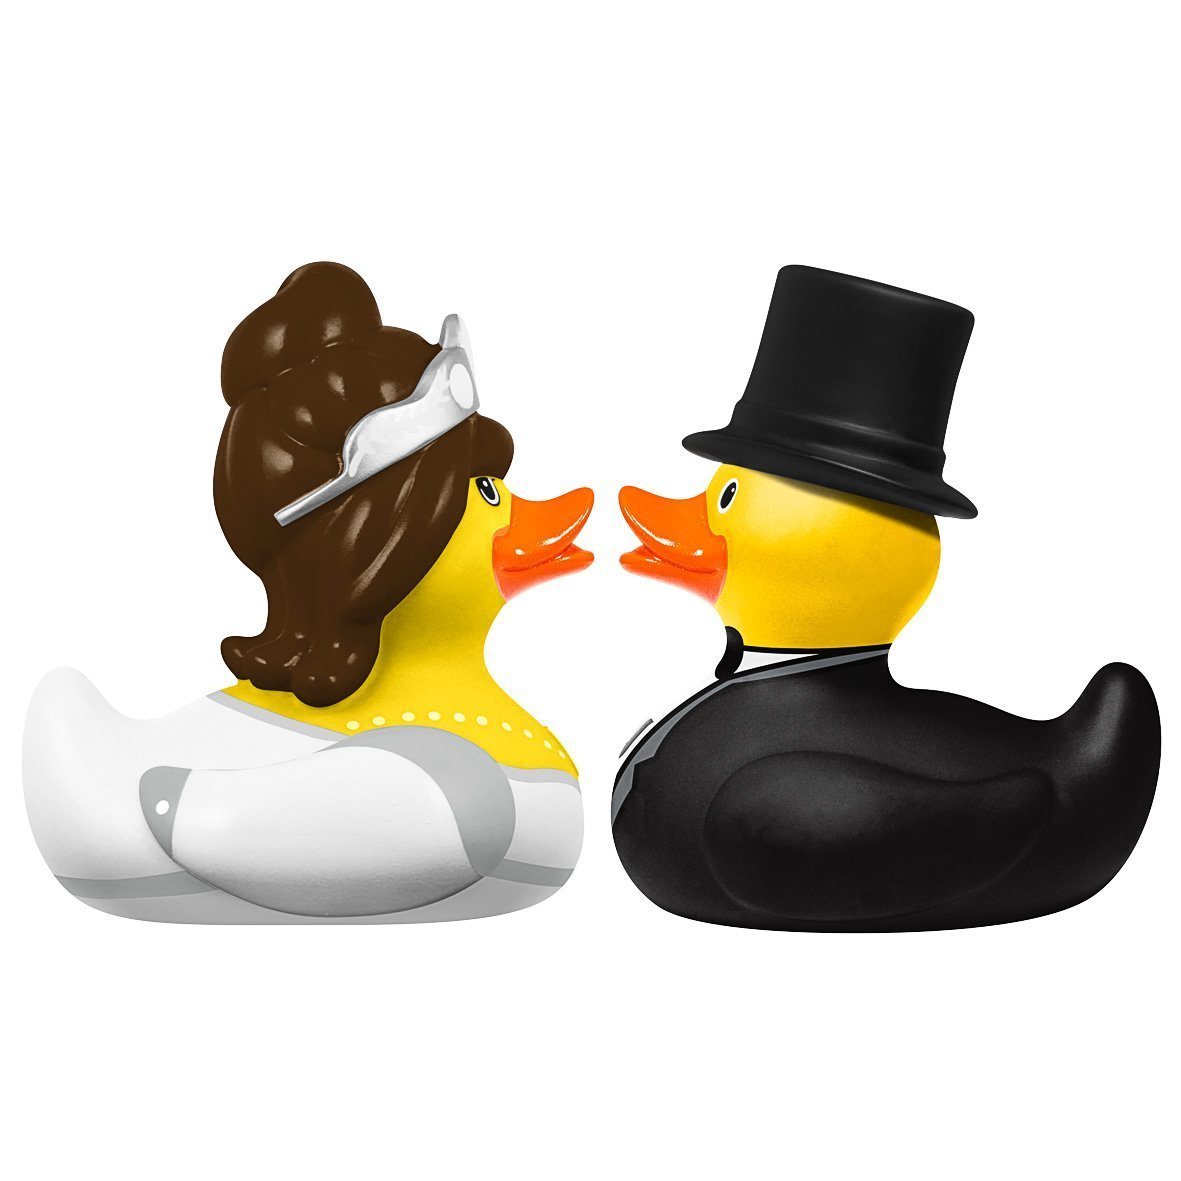 'Bud ? Deluxe Mini cucks 'Bride & Groom Ducks (1396) Design Room